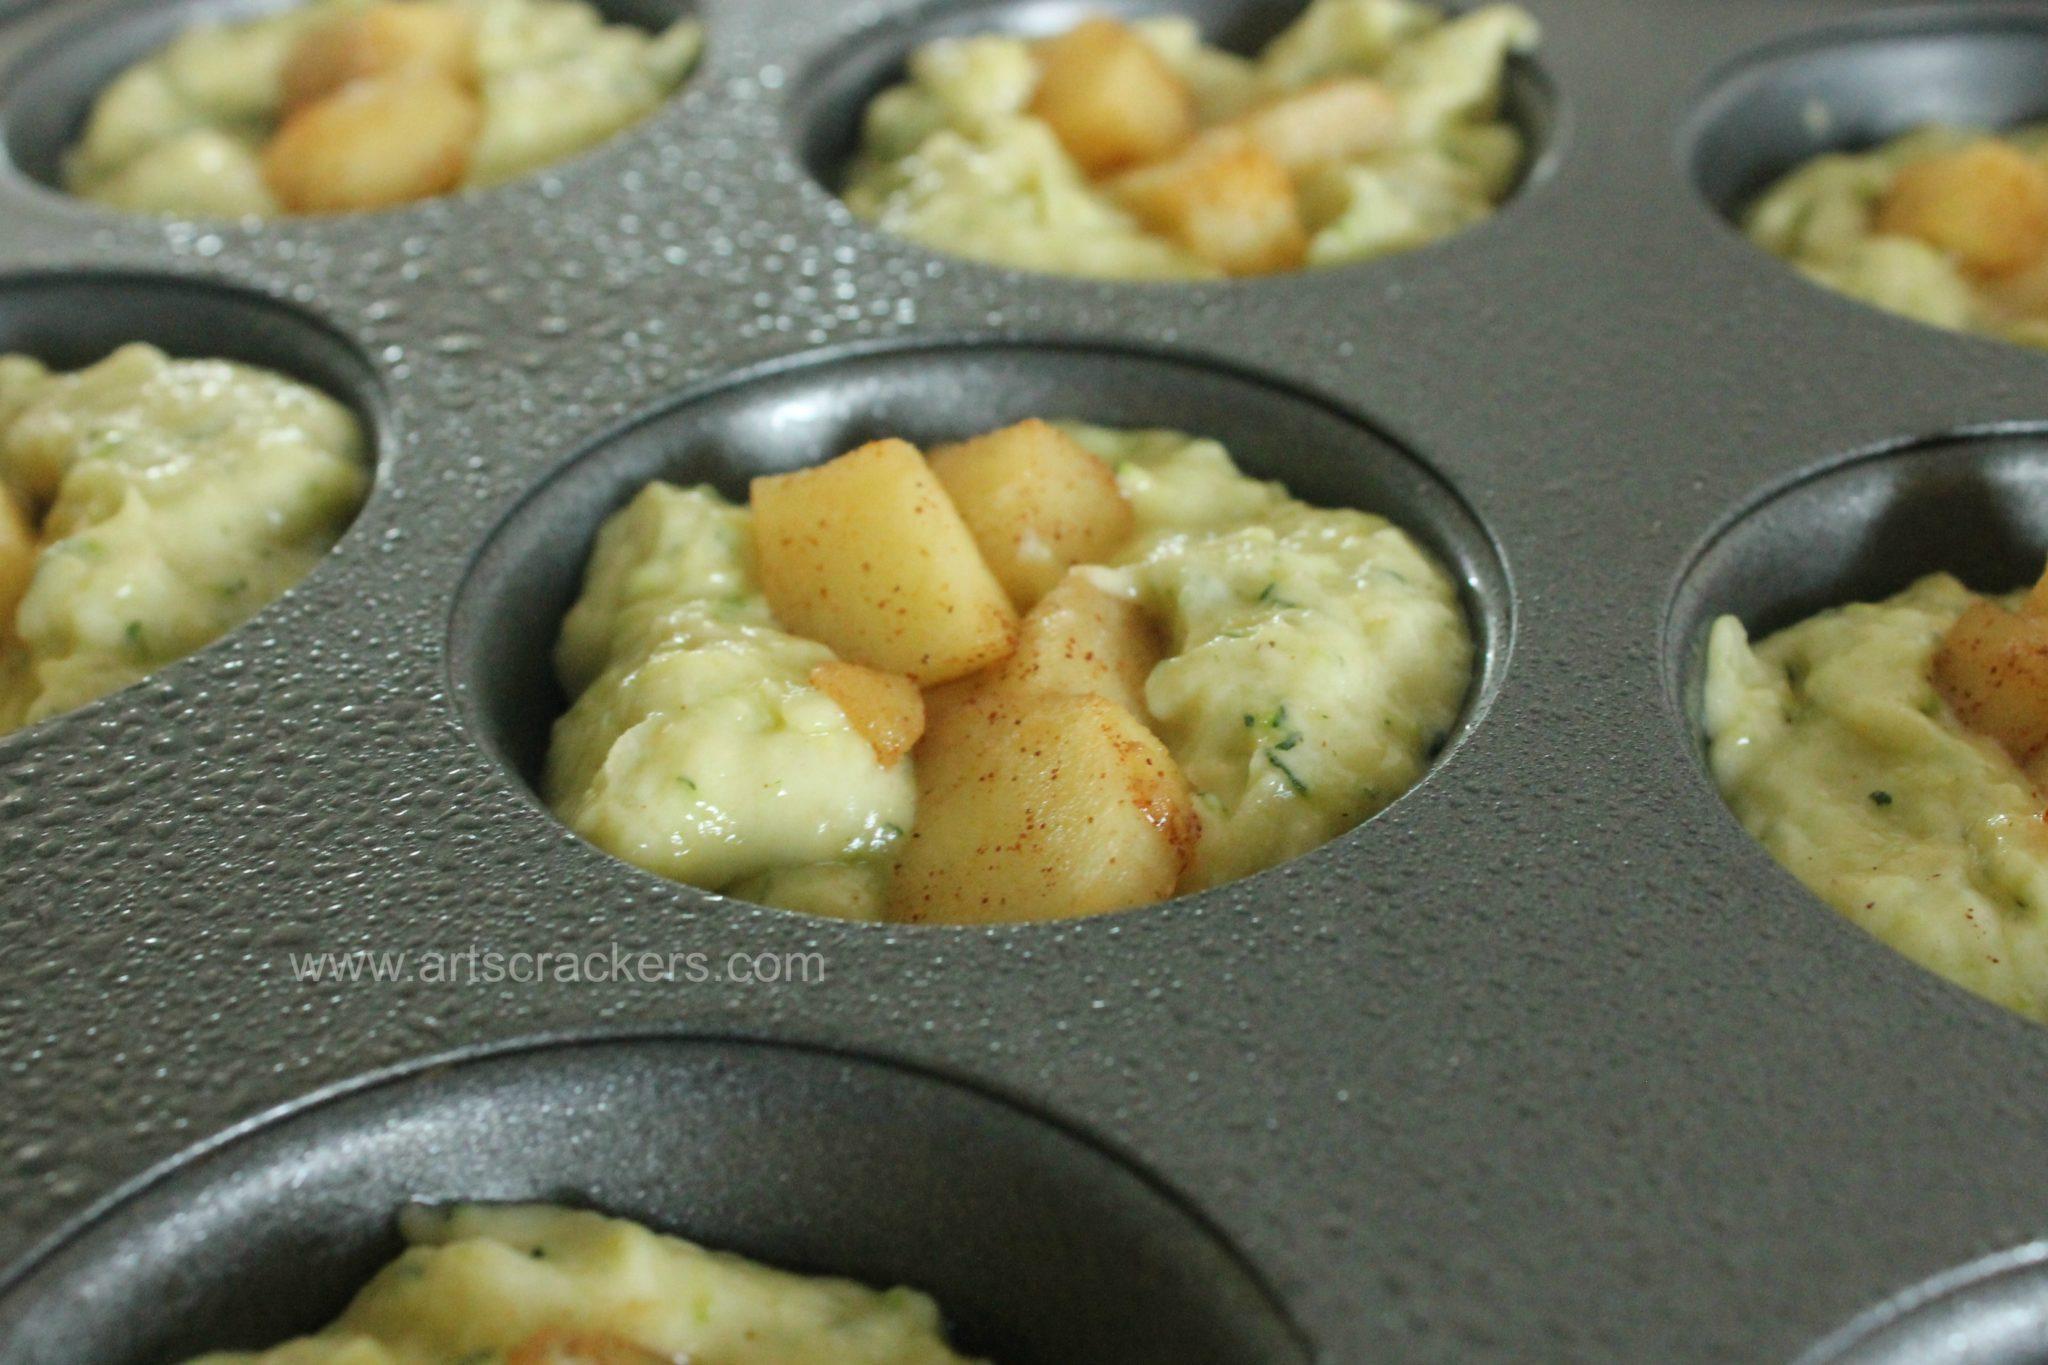 Cinnamon Apple Zucchini Muffins Topping